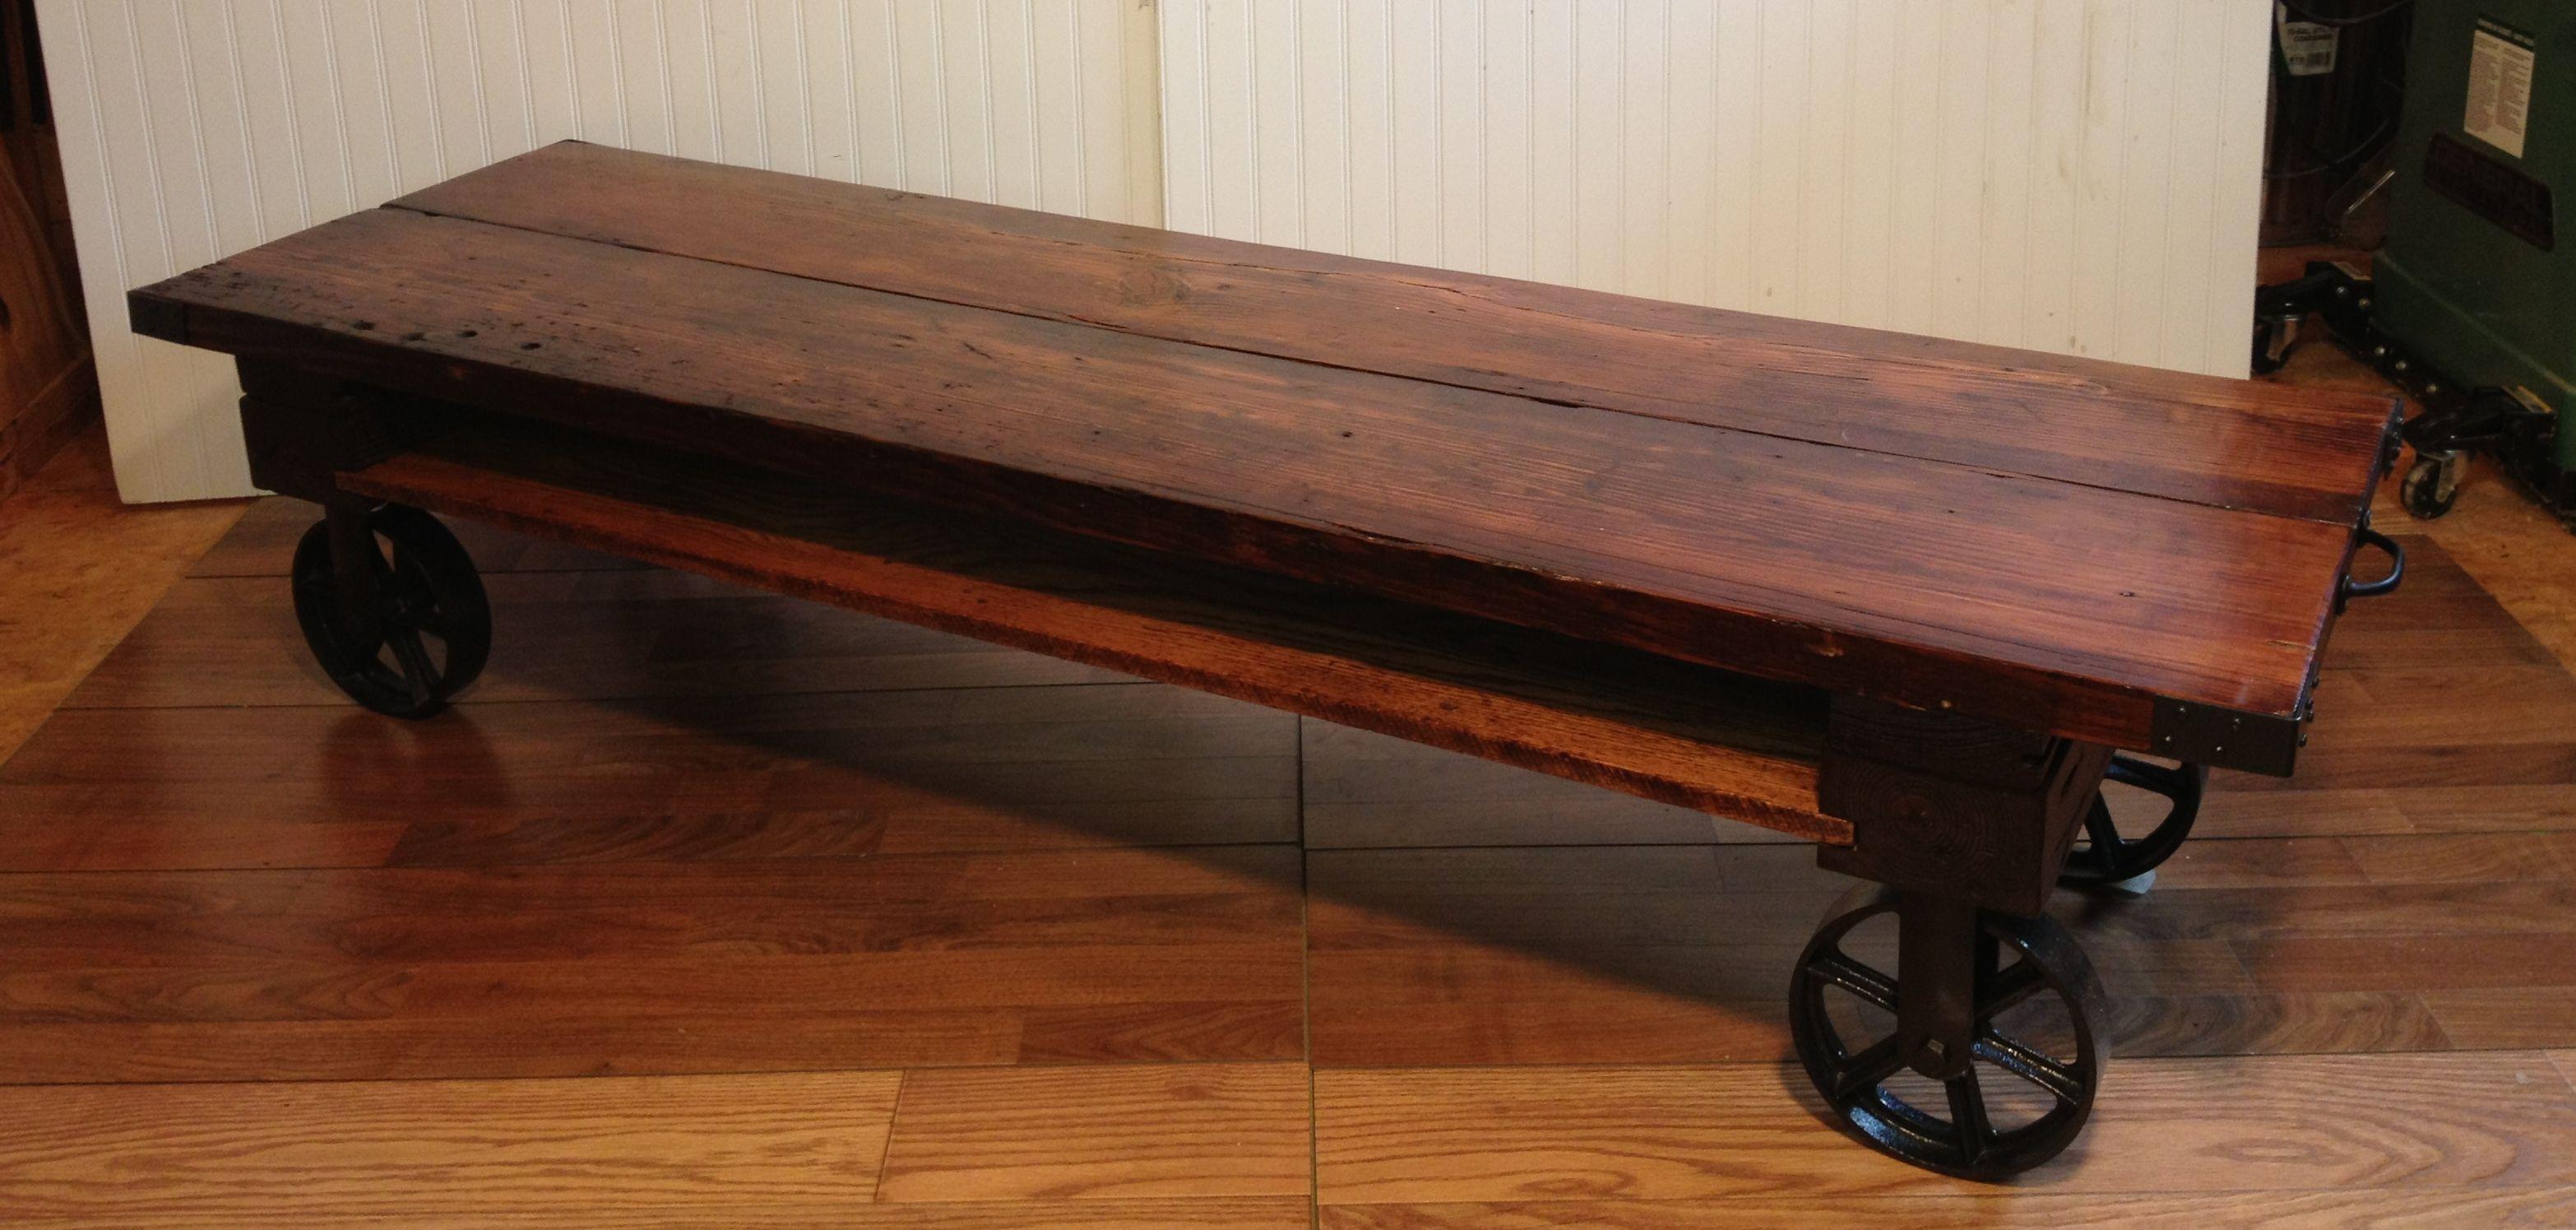 - Living Room. Glossy Dark Brown Wooden Surface Of Industrial Coffee